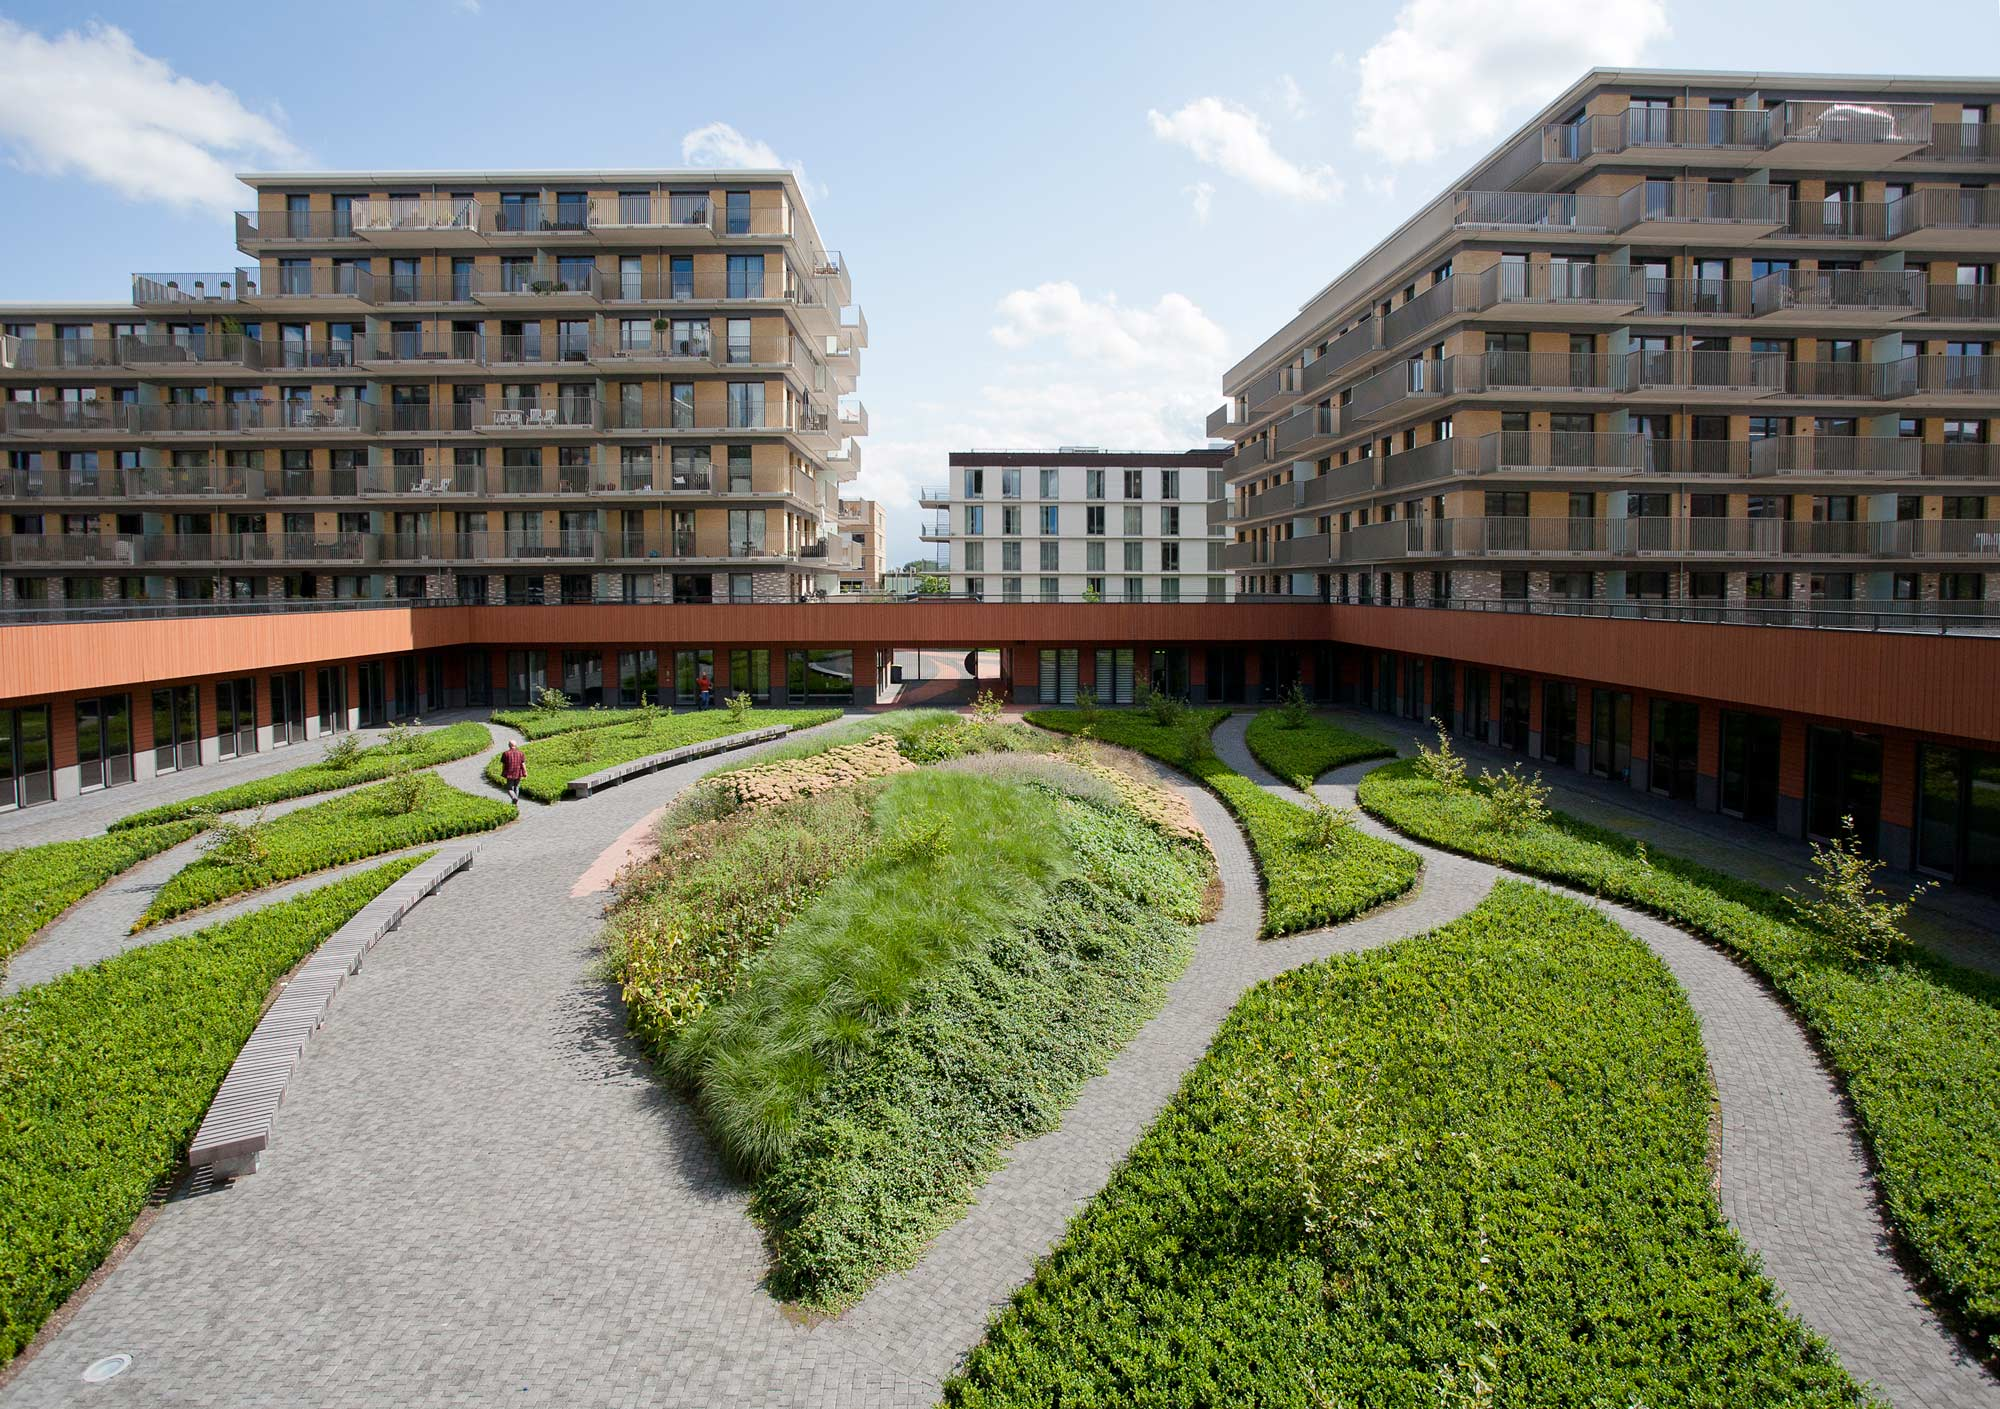 Zonnehuis care home patio residential park 01 landscape for American landscape architects